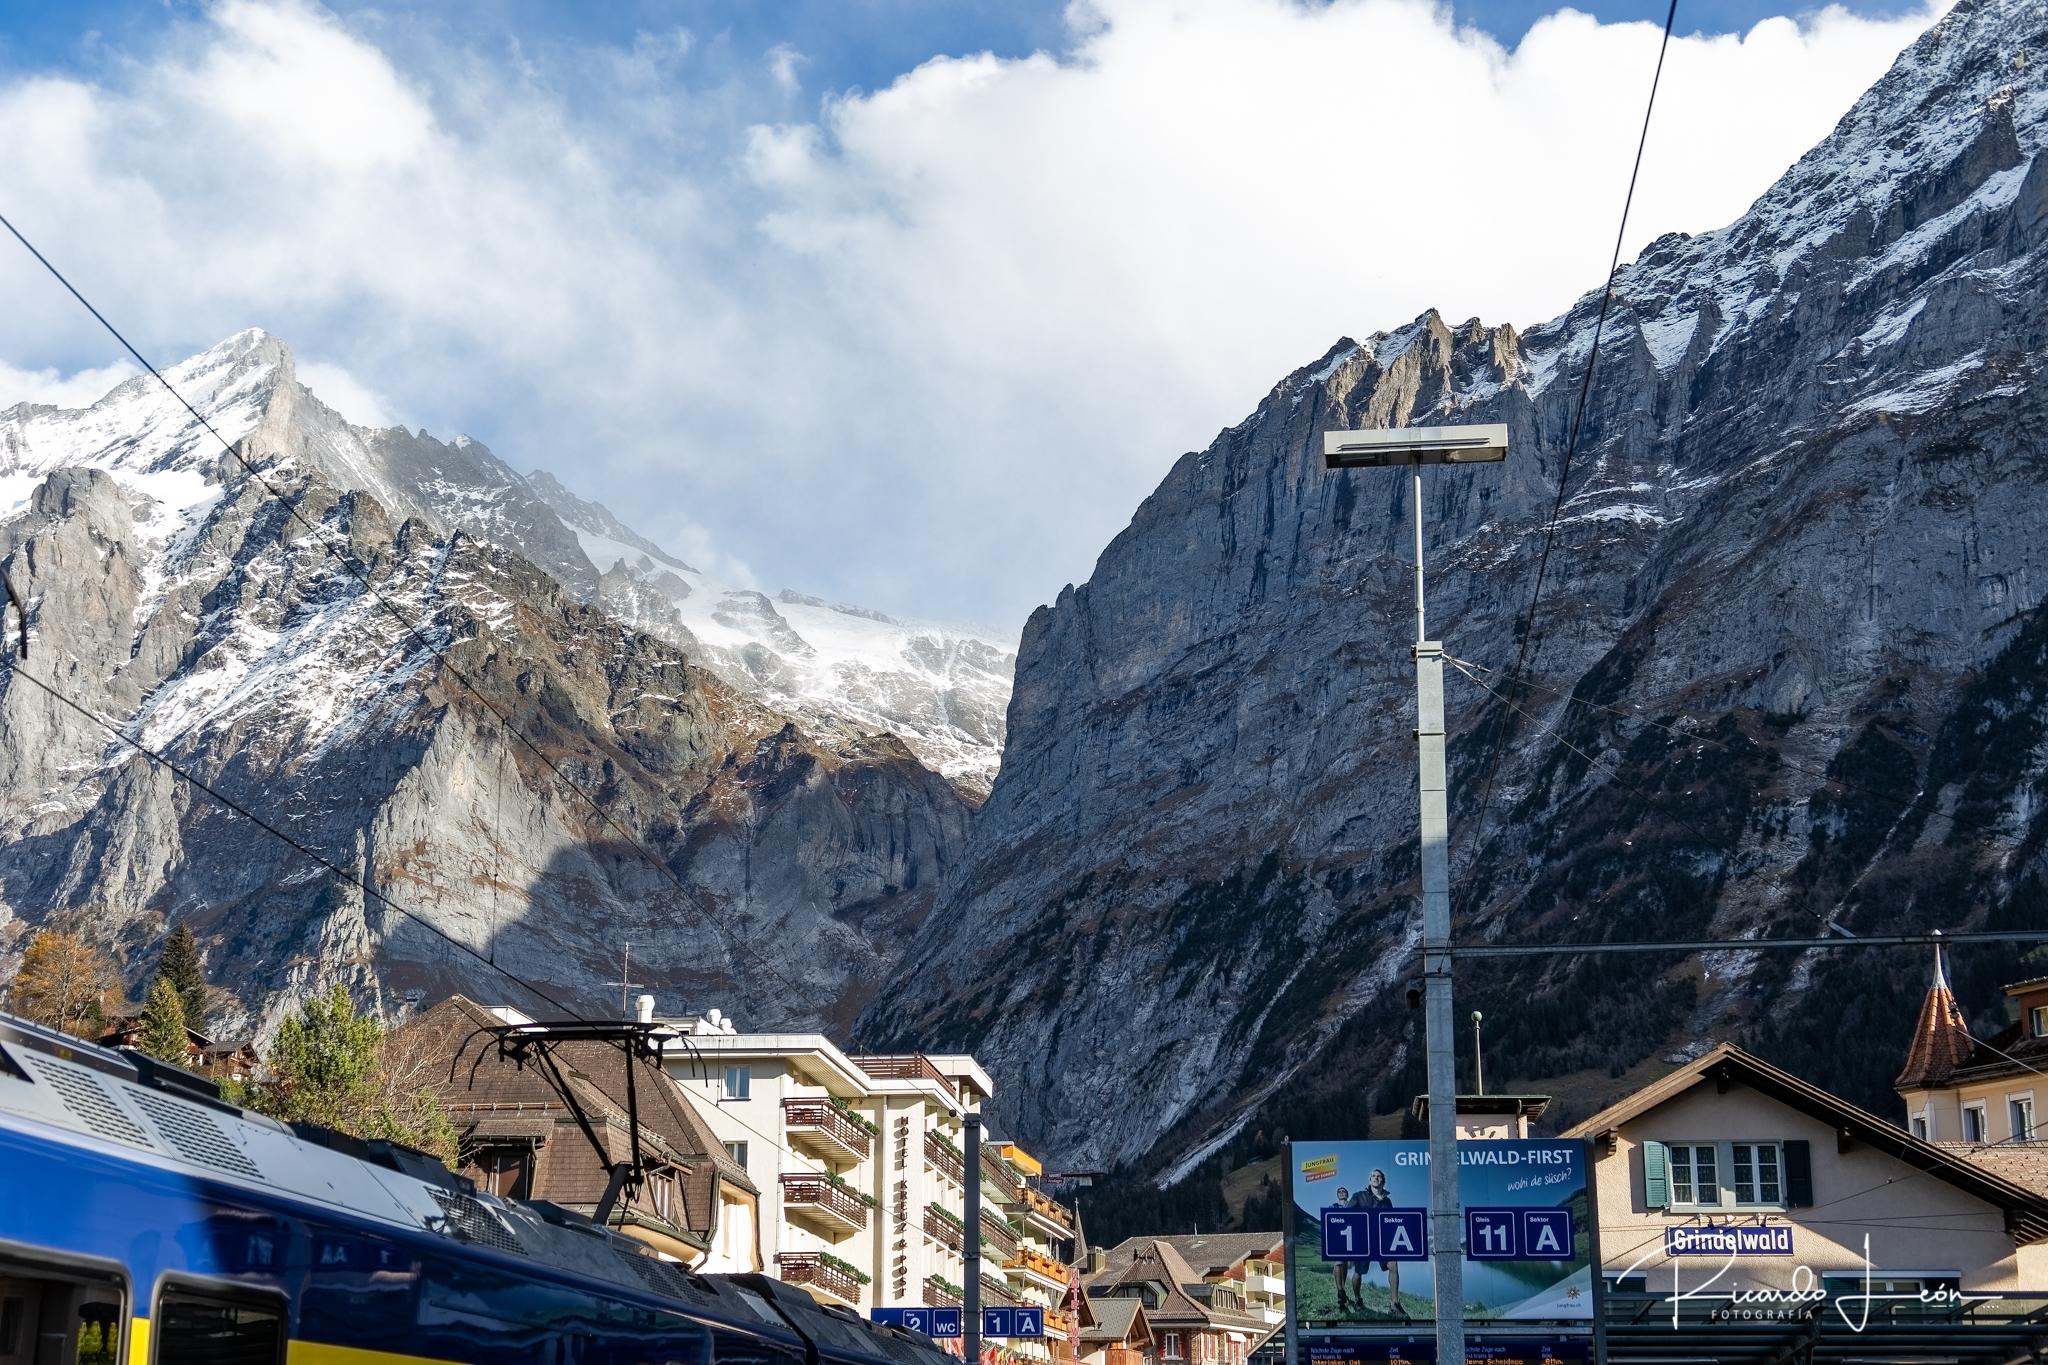 WIX_Viaje a Jungfraujoch_MG_6003